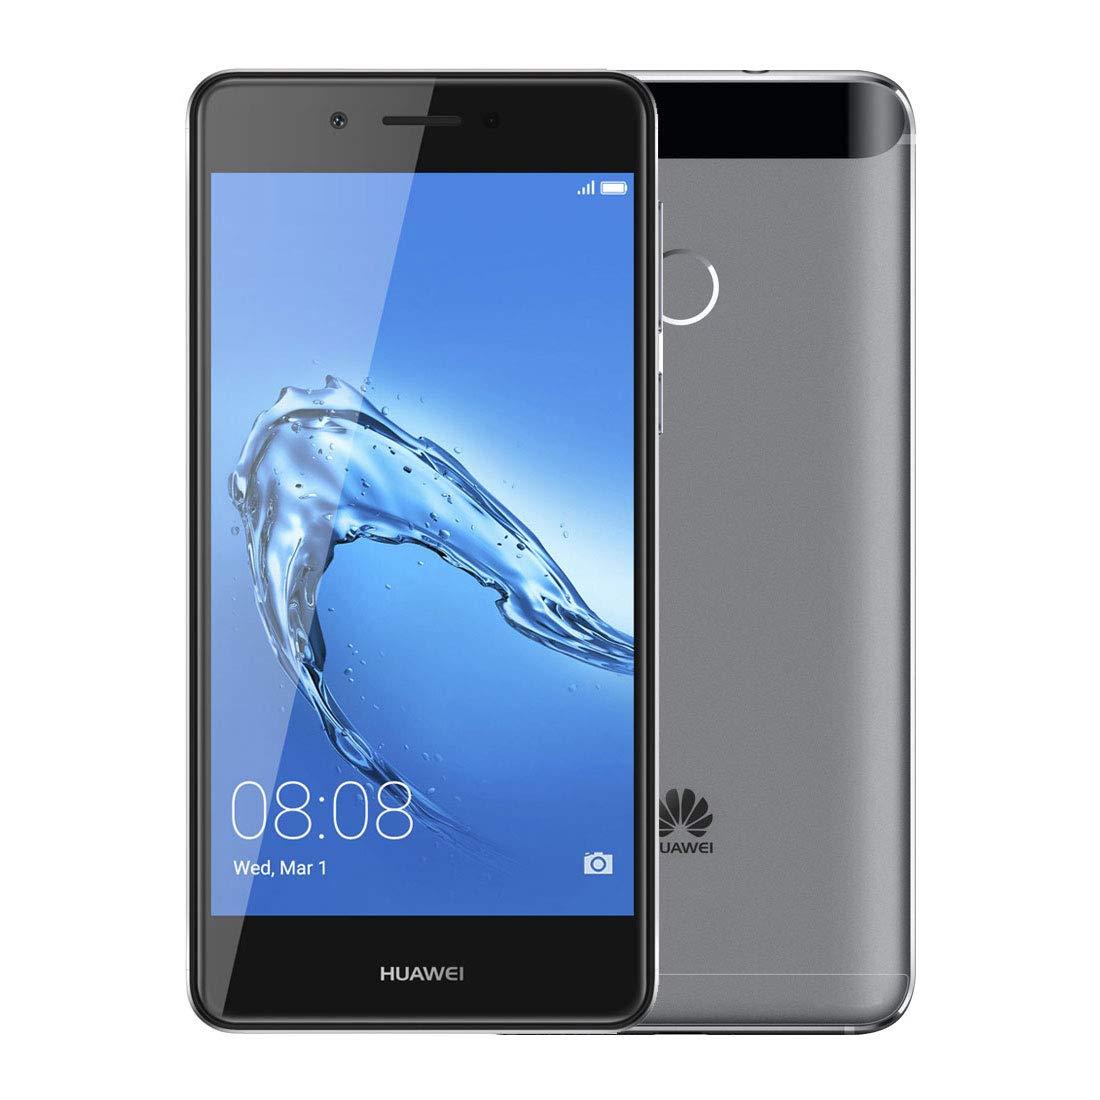 HUAWEI - Nova Smart Tim: Amazon.es: Electrónica